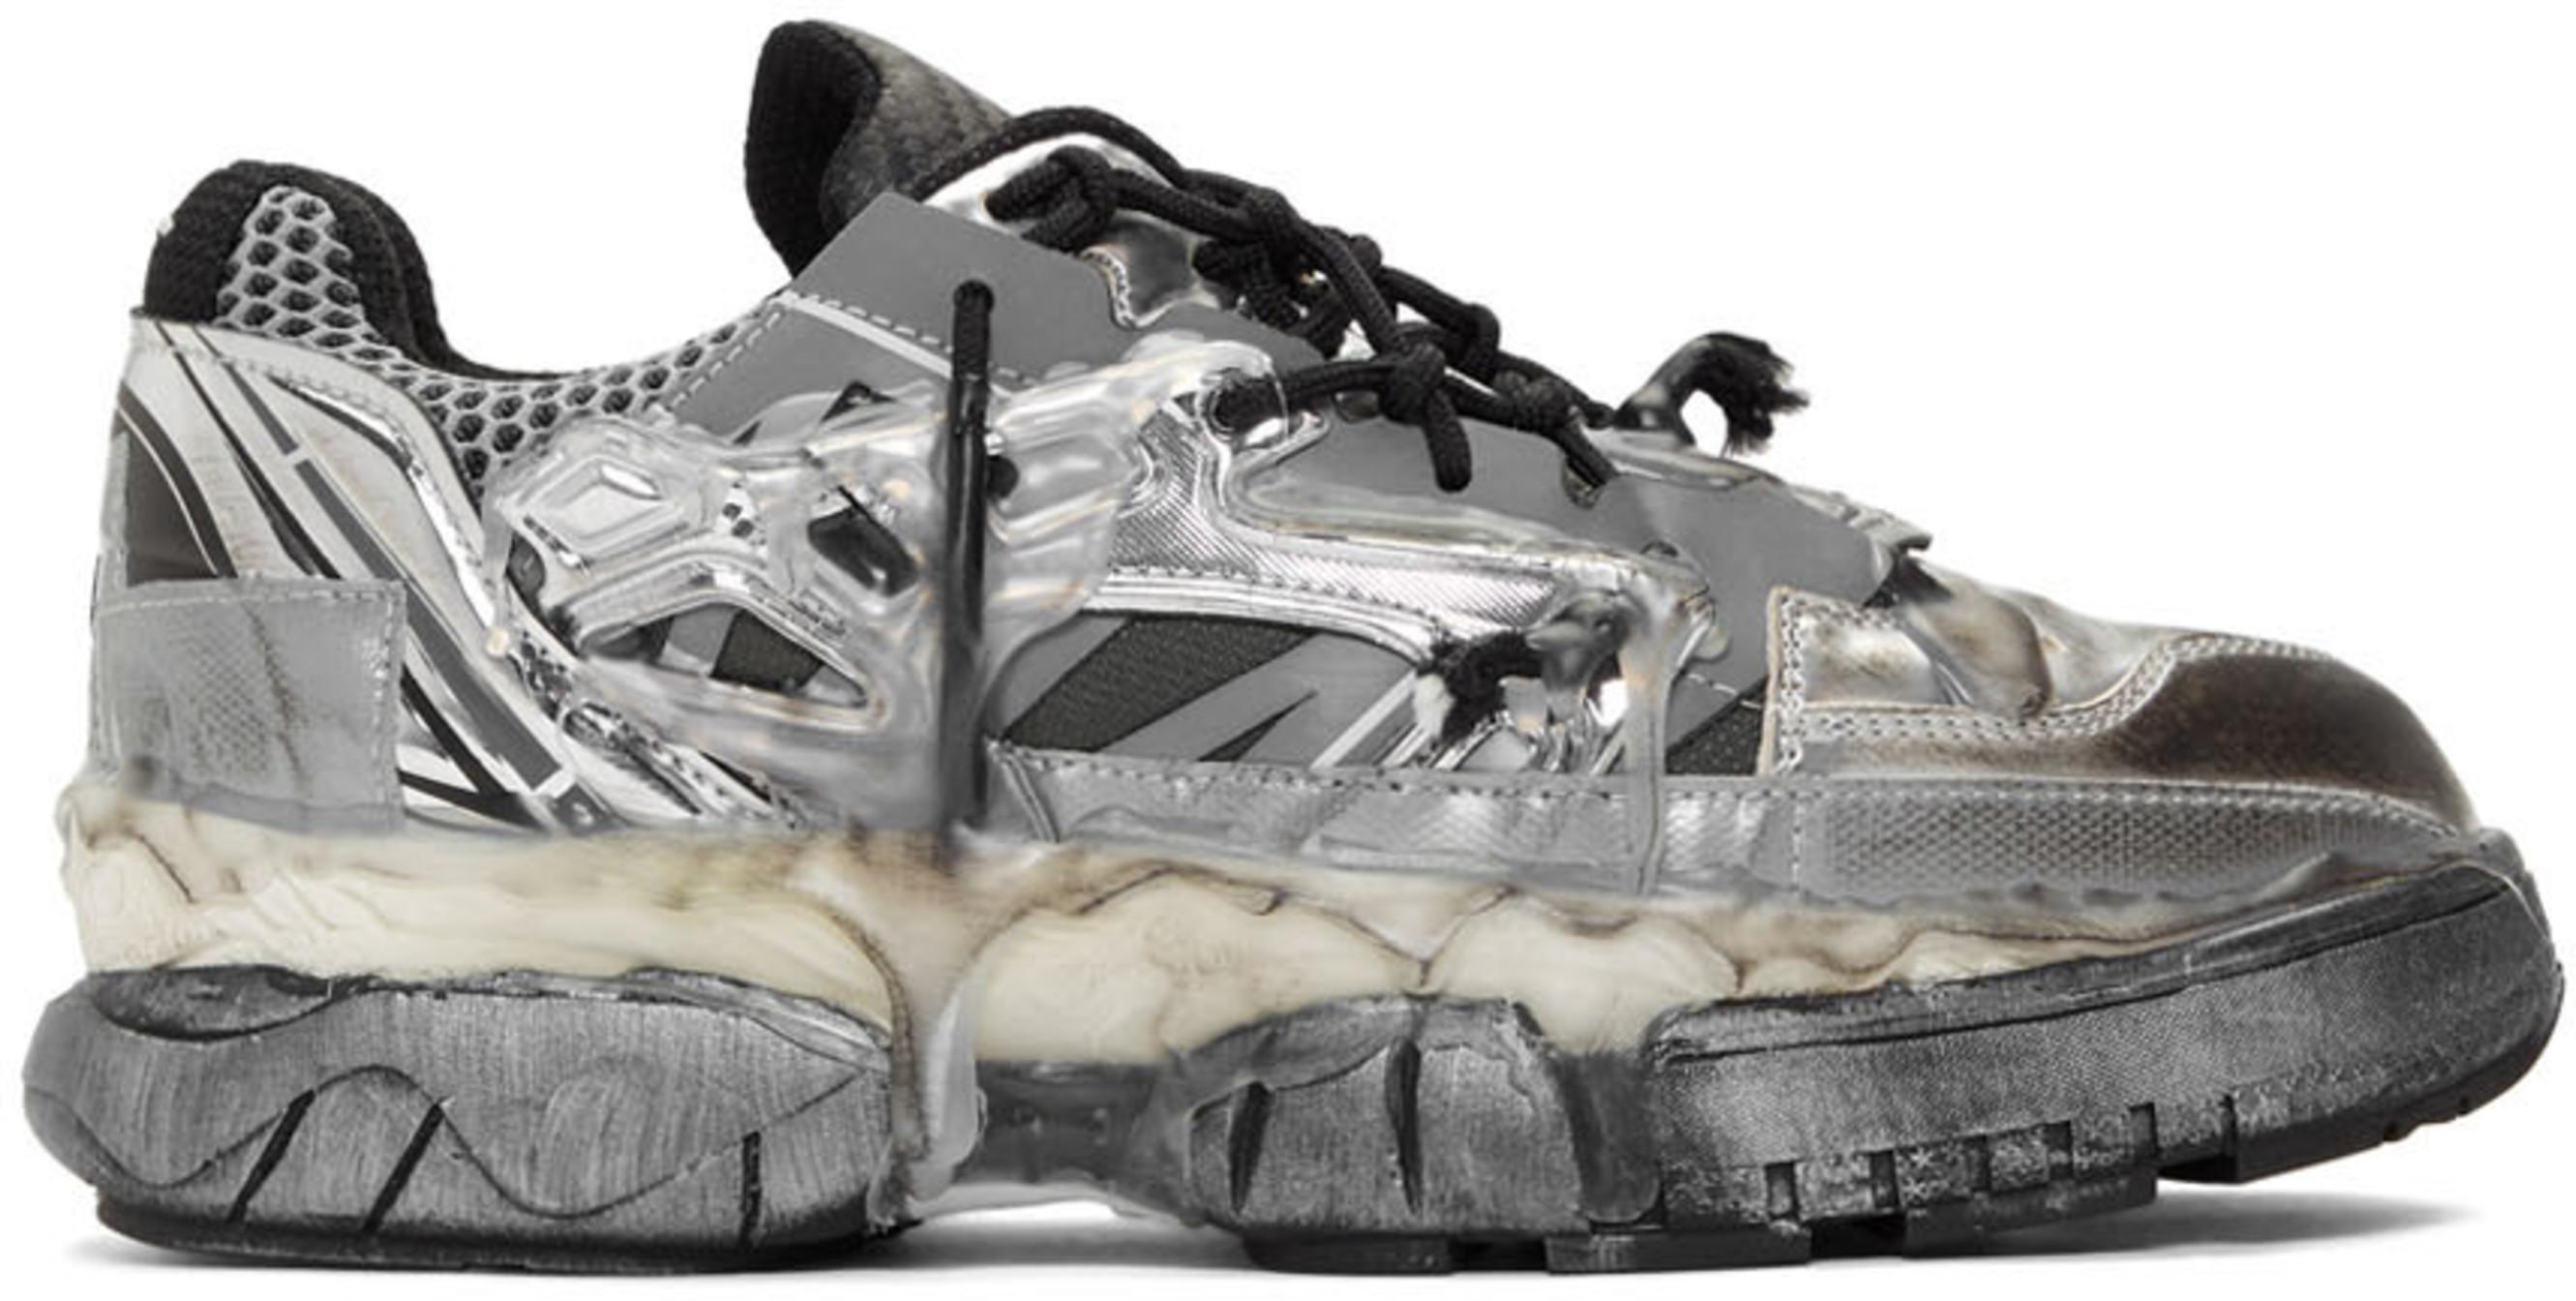 Army Del SneakersVert Gree Toms Rey vn0O8mNywP